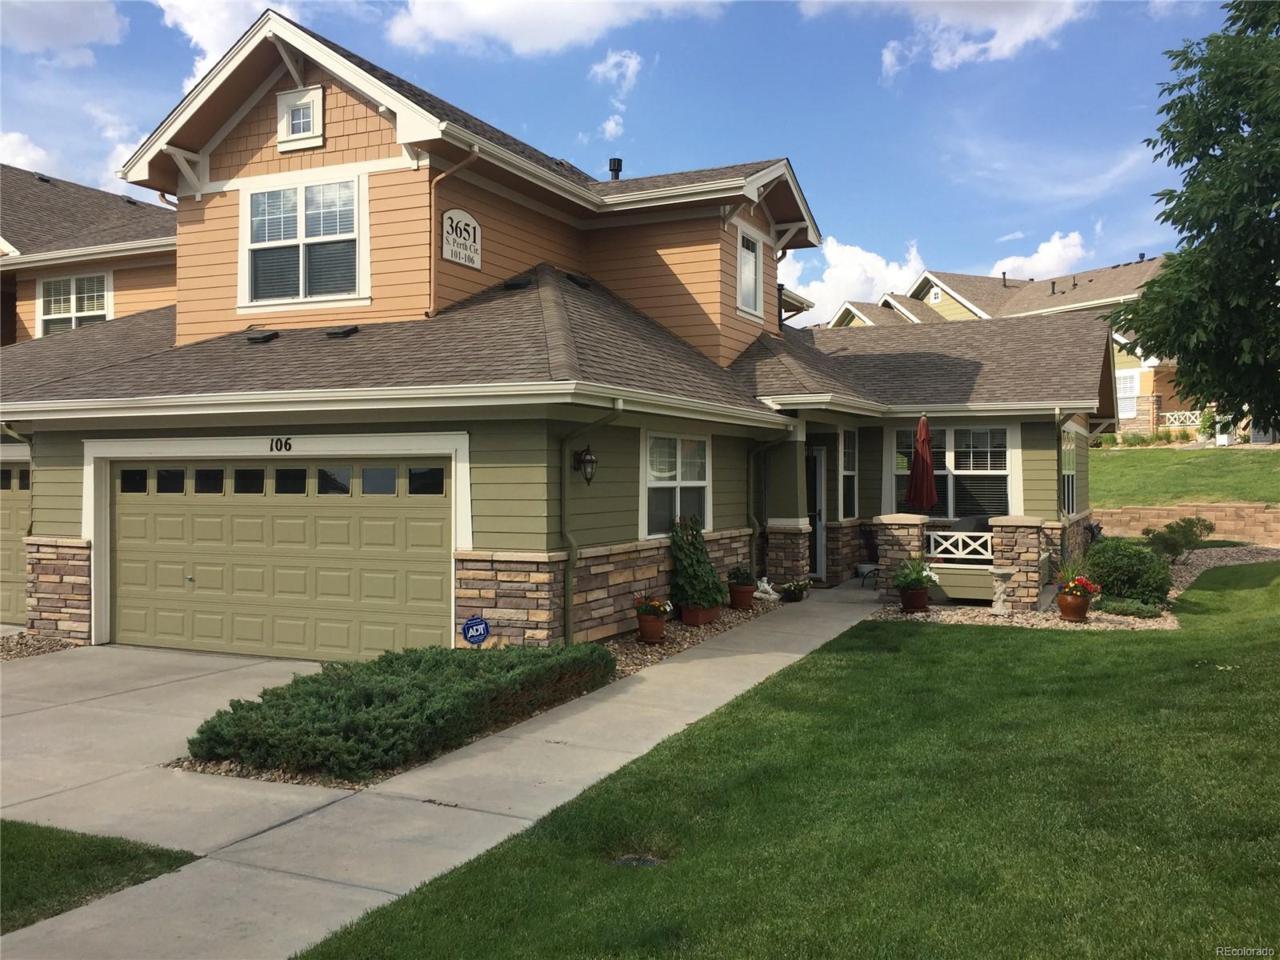 3651 S Perth Circle #106, Aurora, CO 80013 (MLS #7828477) :: 8z Real Estate